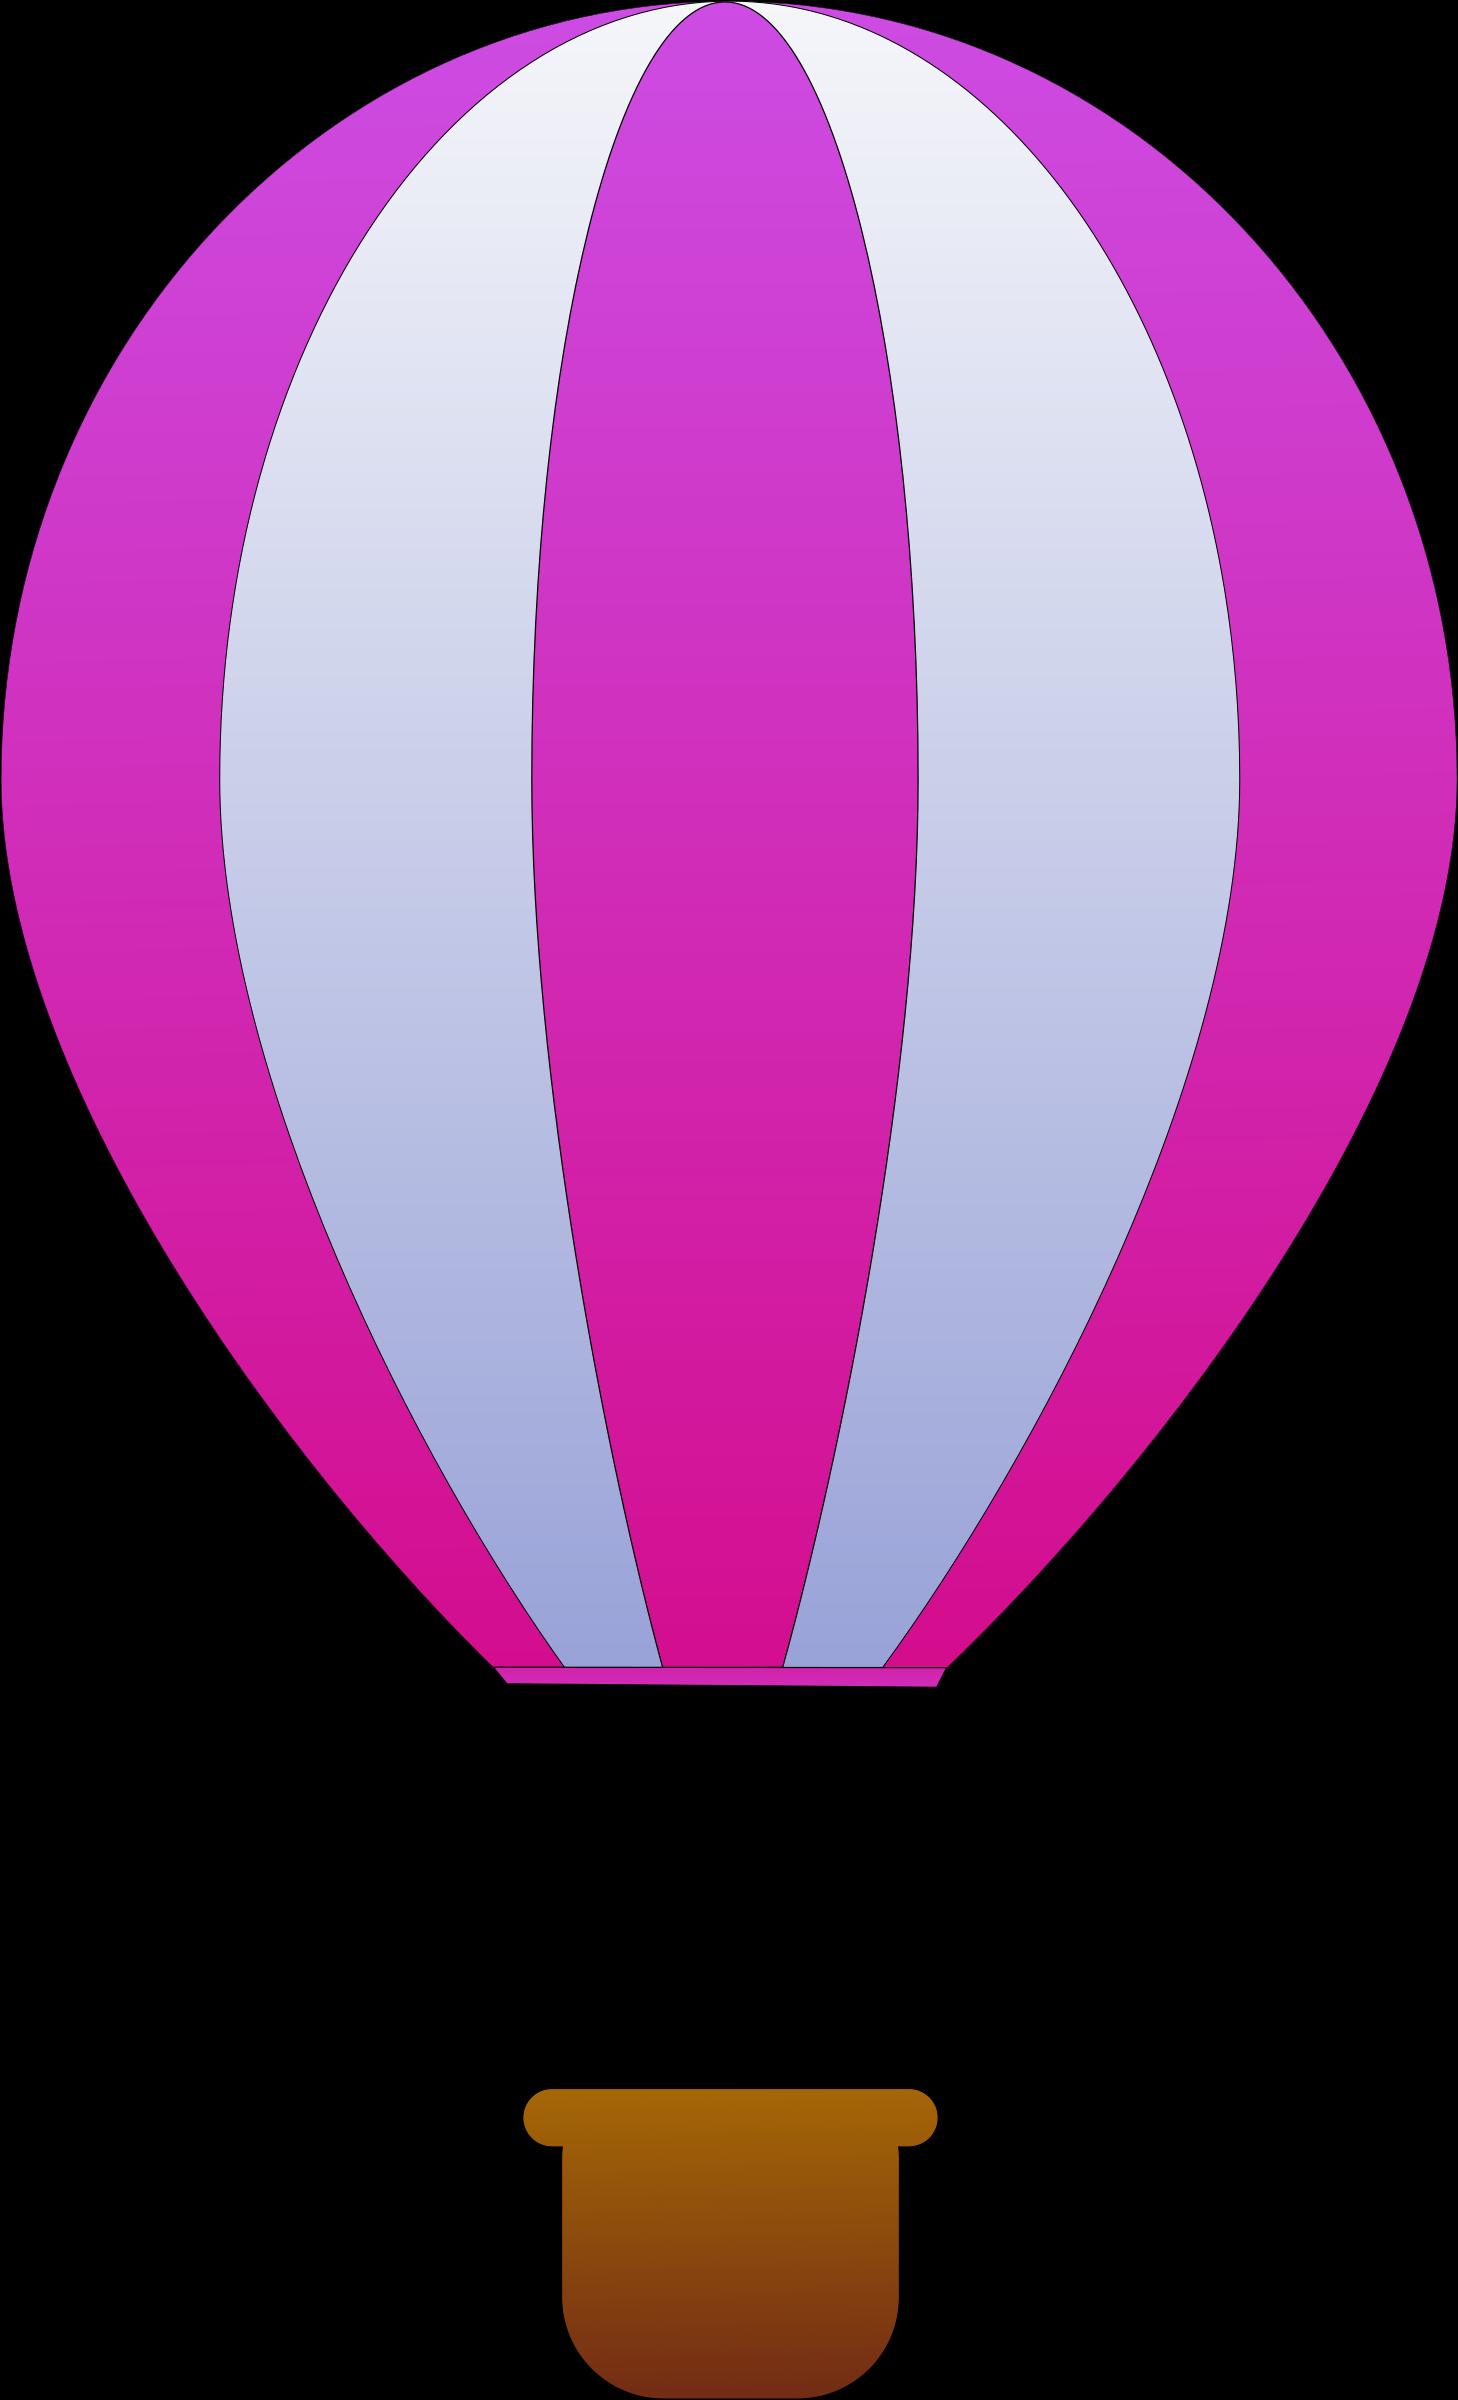 Car stripe clipart clip art royalty free stock Clipart - Vertical Striped Hot Air Balloons 3 clip art royalty free stock